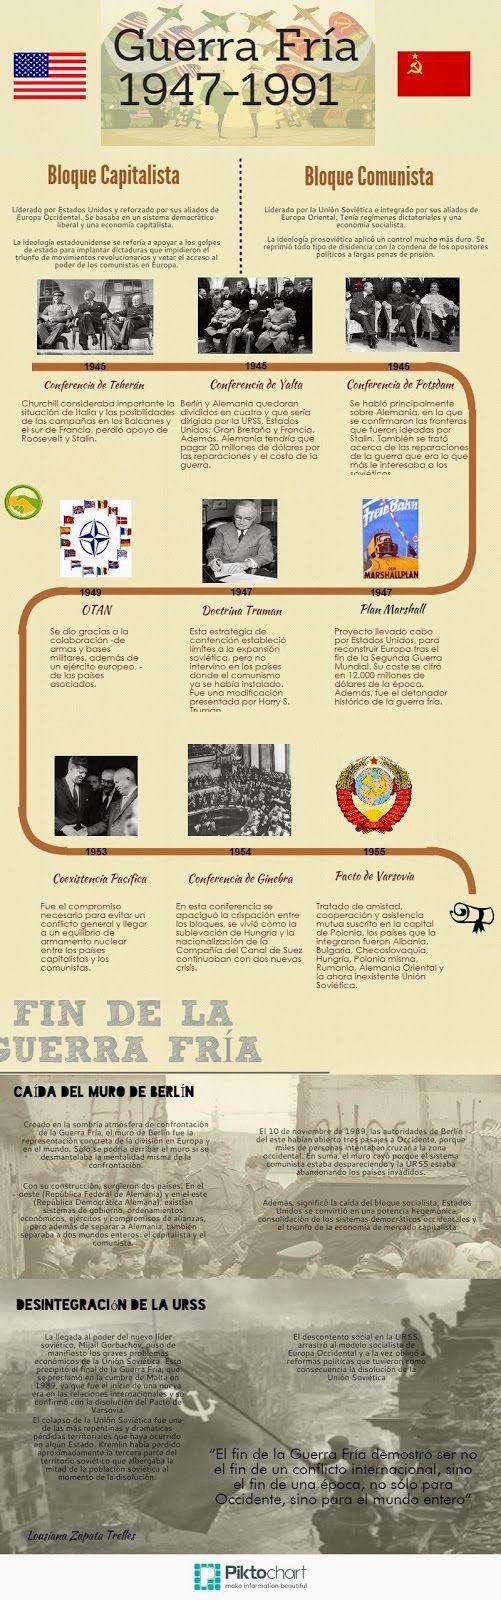 Hacer Historia: Infogramas